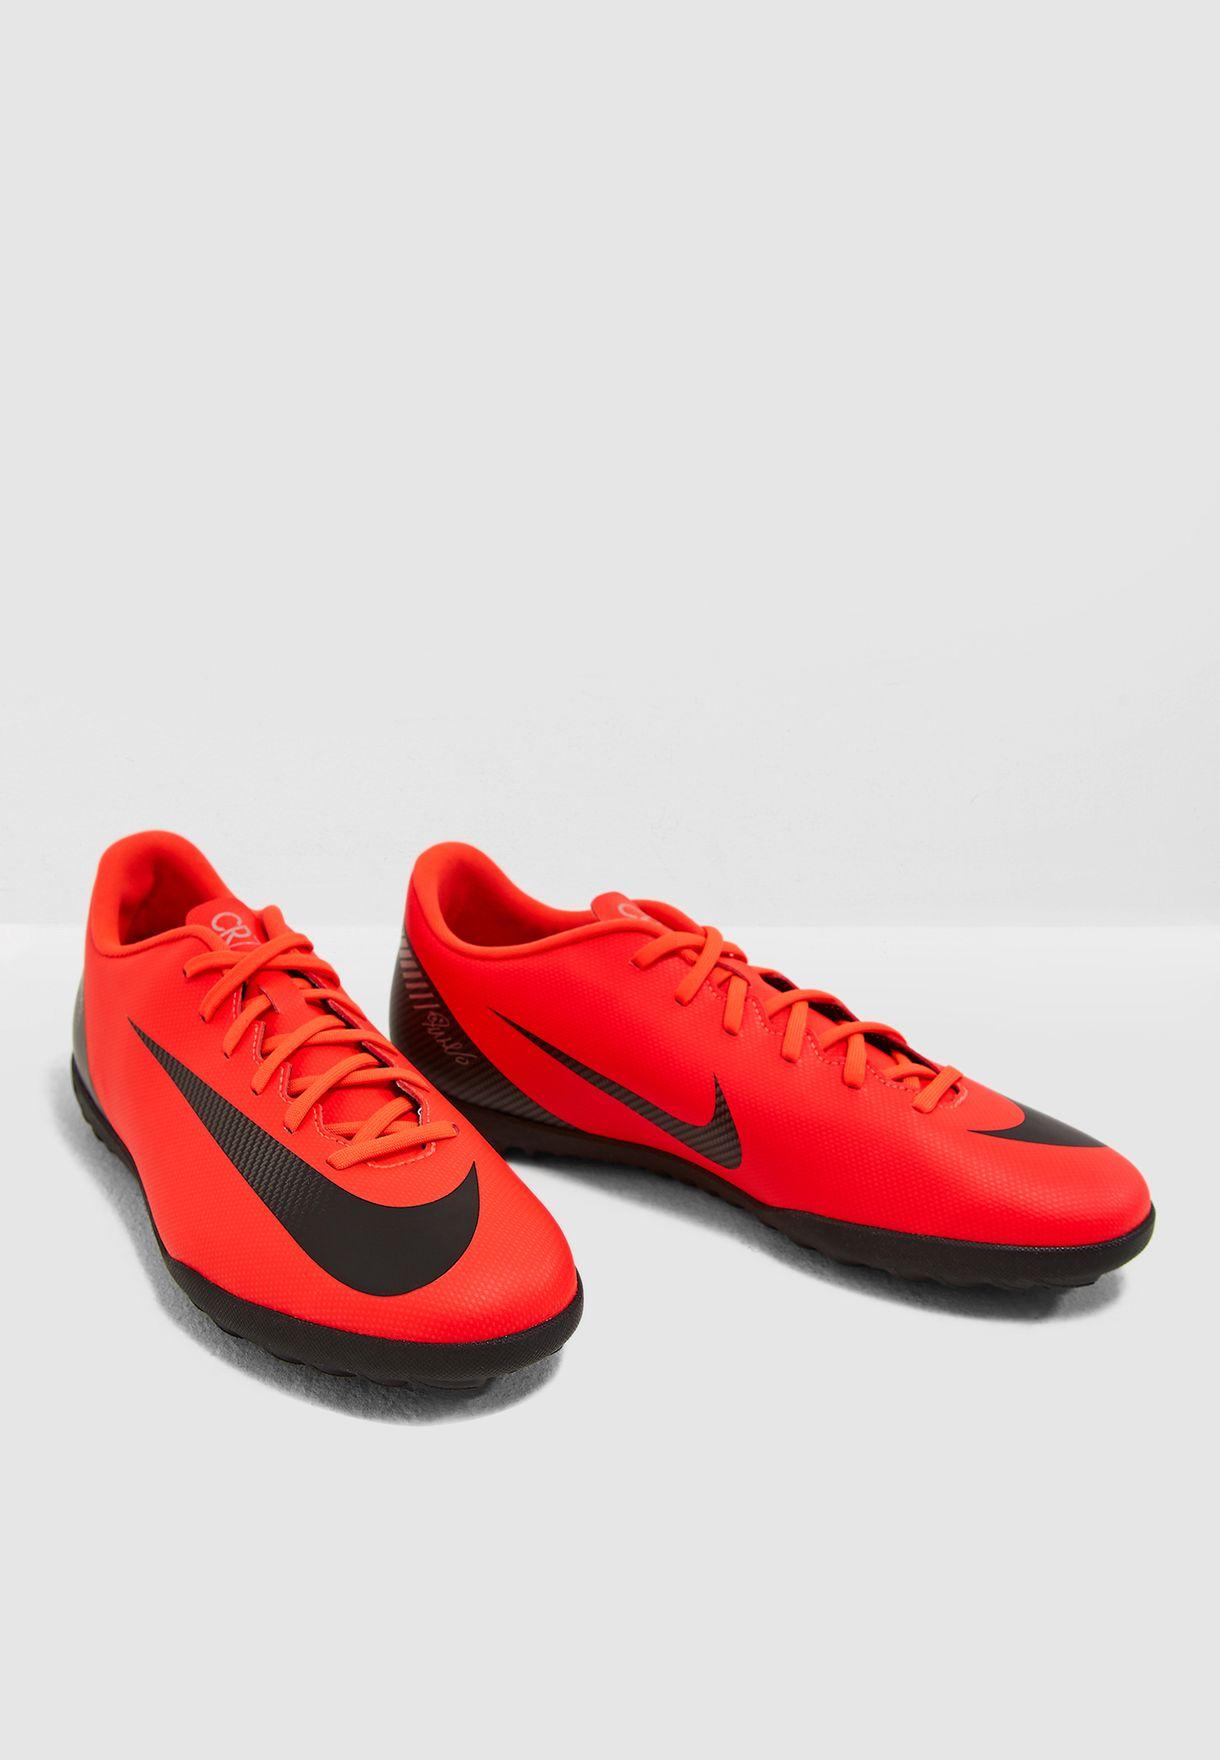 738de85e138 Shop Nike red Mercurial Vaporx 12 Club CR7 TF AJ3738-600 for Men in ...